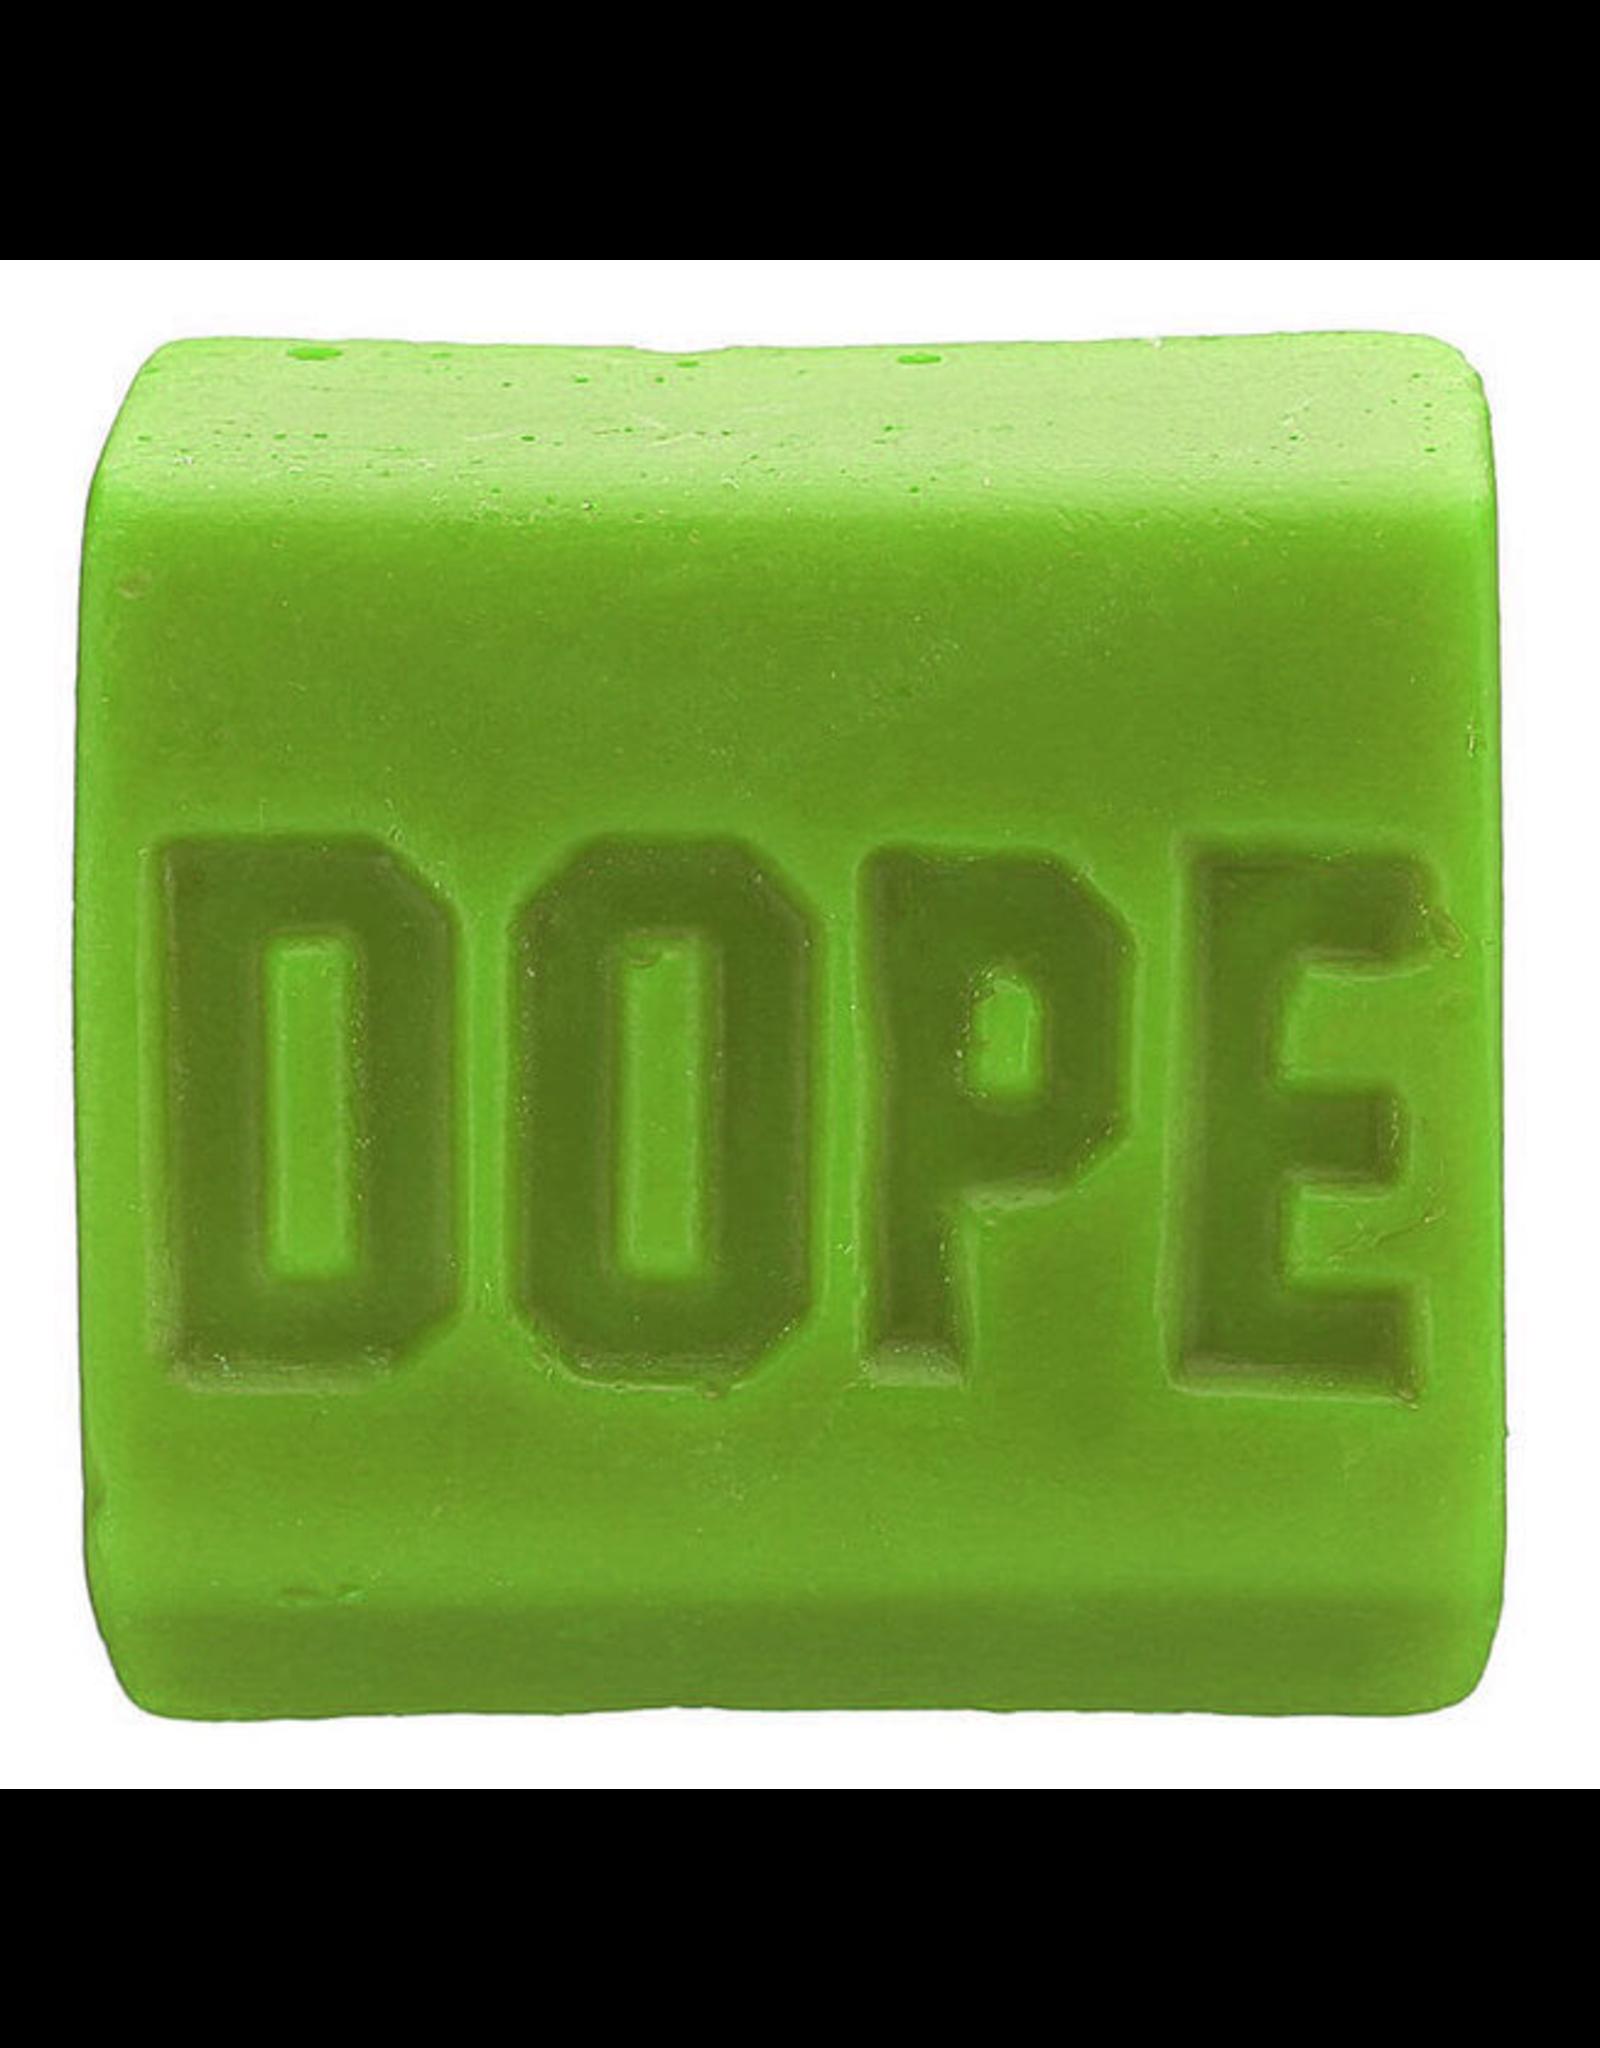 DOPE Dope Skate Wax OG Green Lime Skate Wax